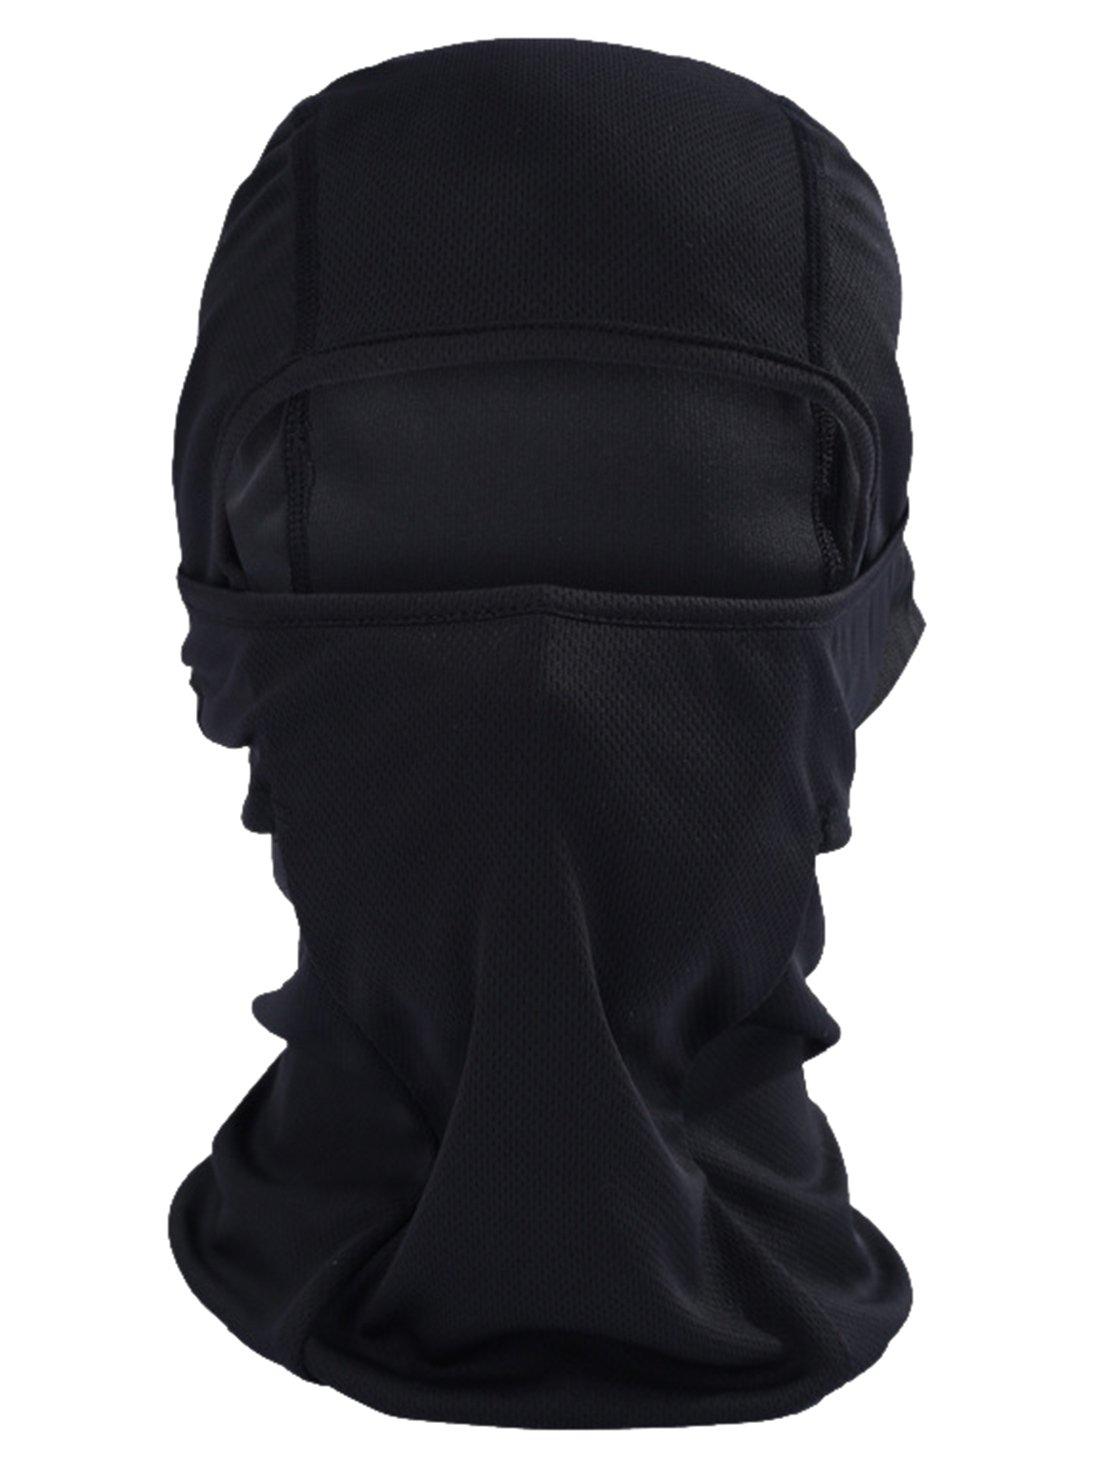 Outdoor Sports Skiing Fishing Neck Hood Full Face Mask Motorcycle Biking Balaclava Black